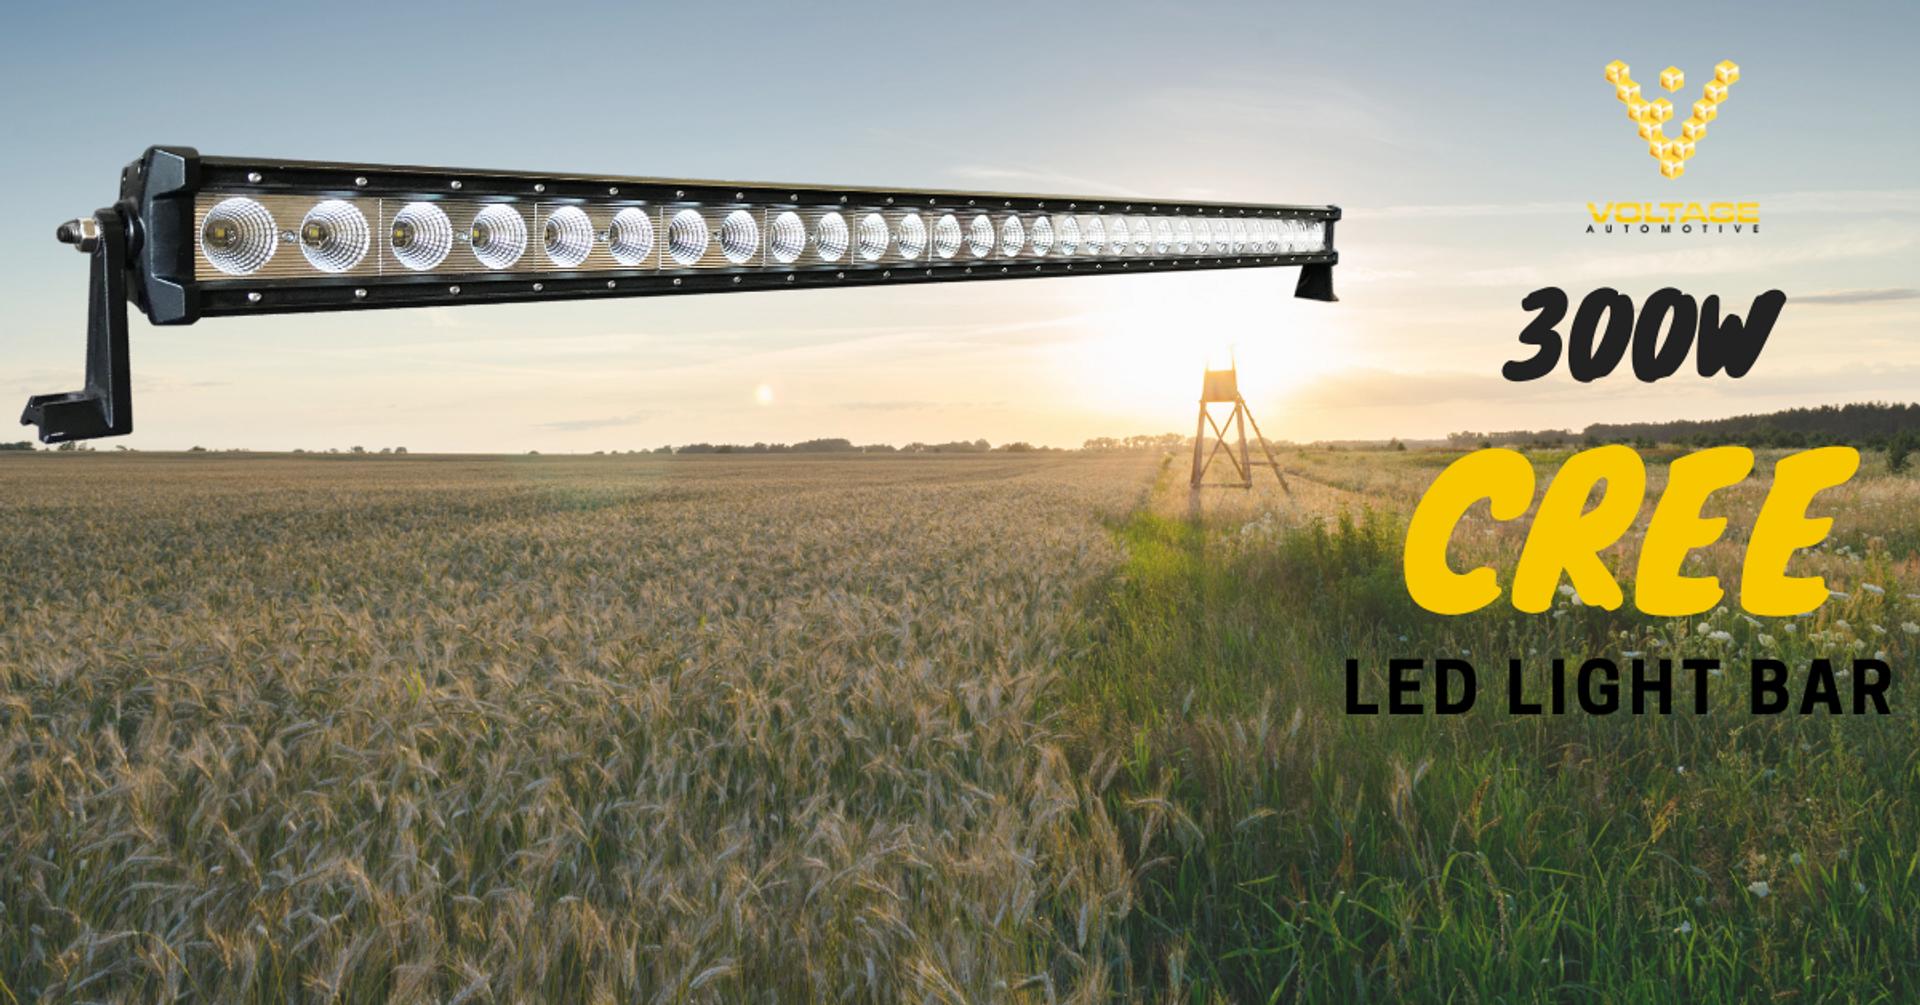 Voltage Automotive LED LIght Bar